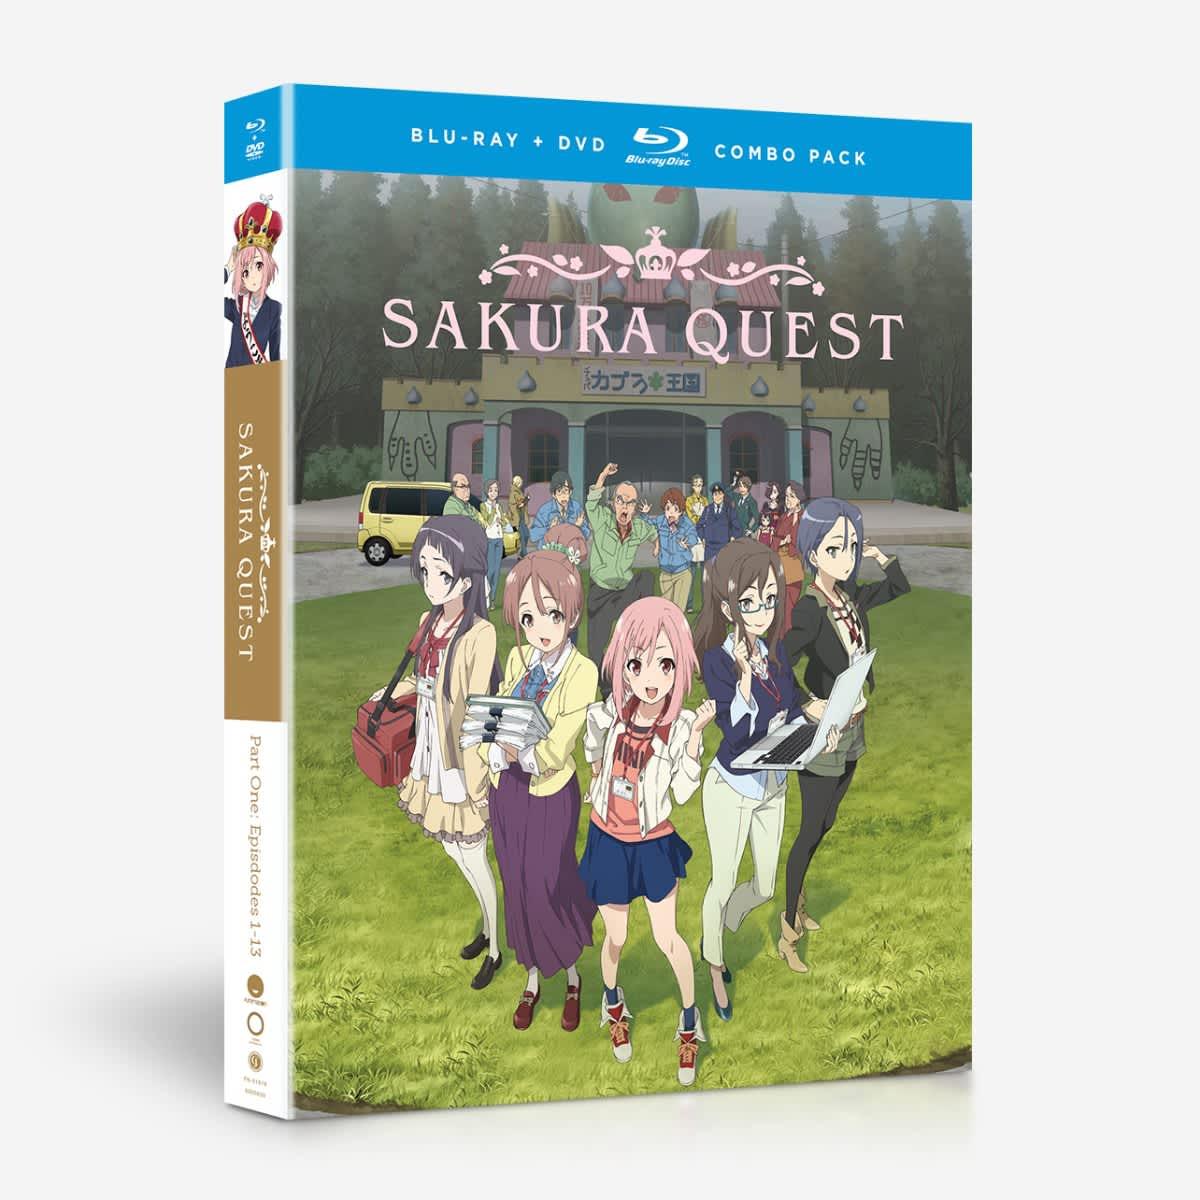 Sakura Quest Part 1 Blu-ray/DVD